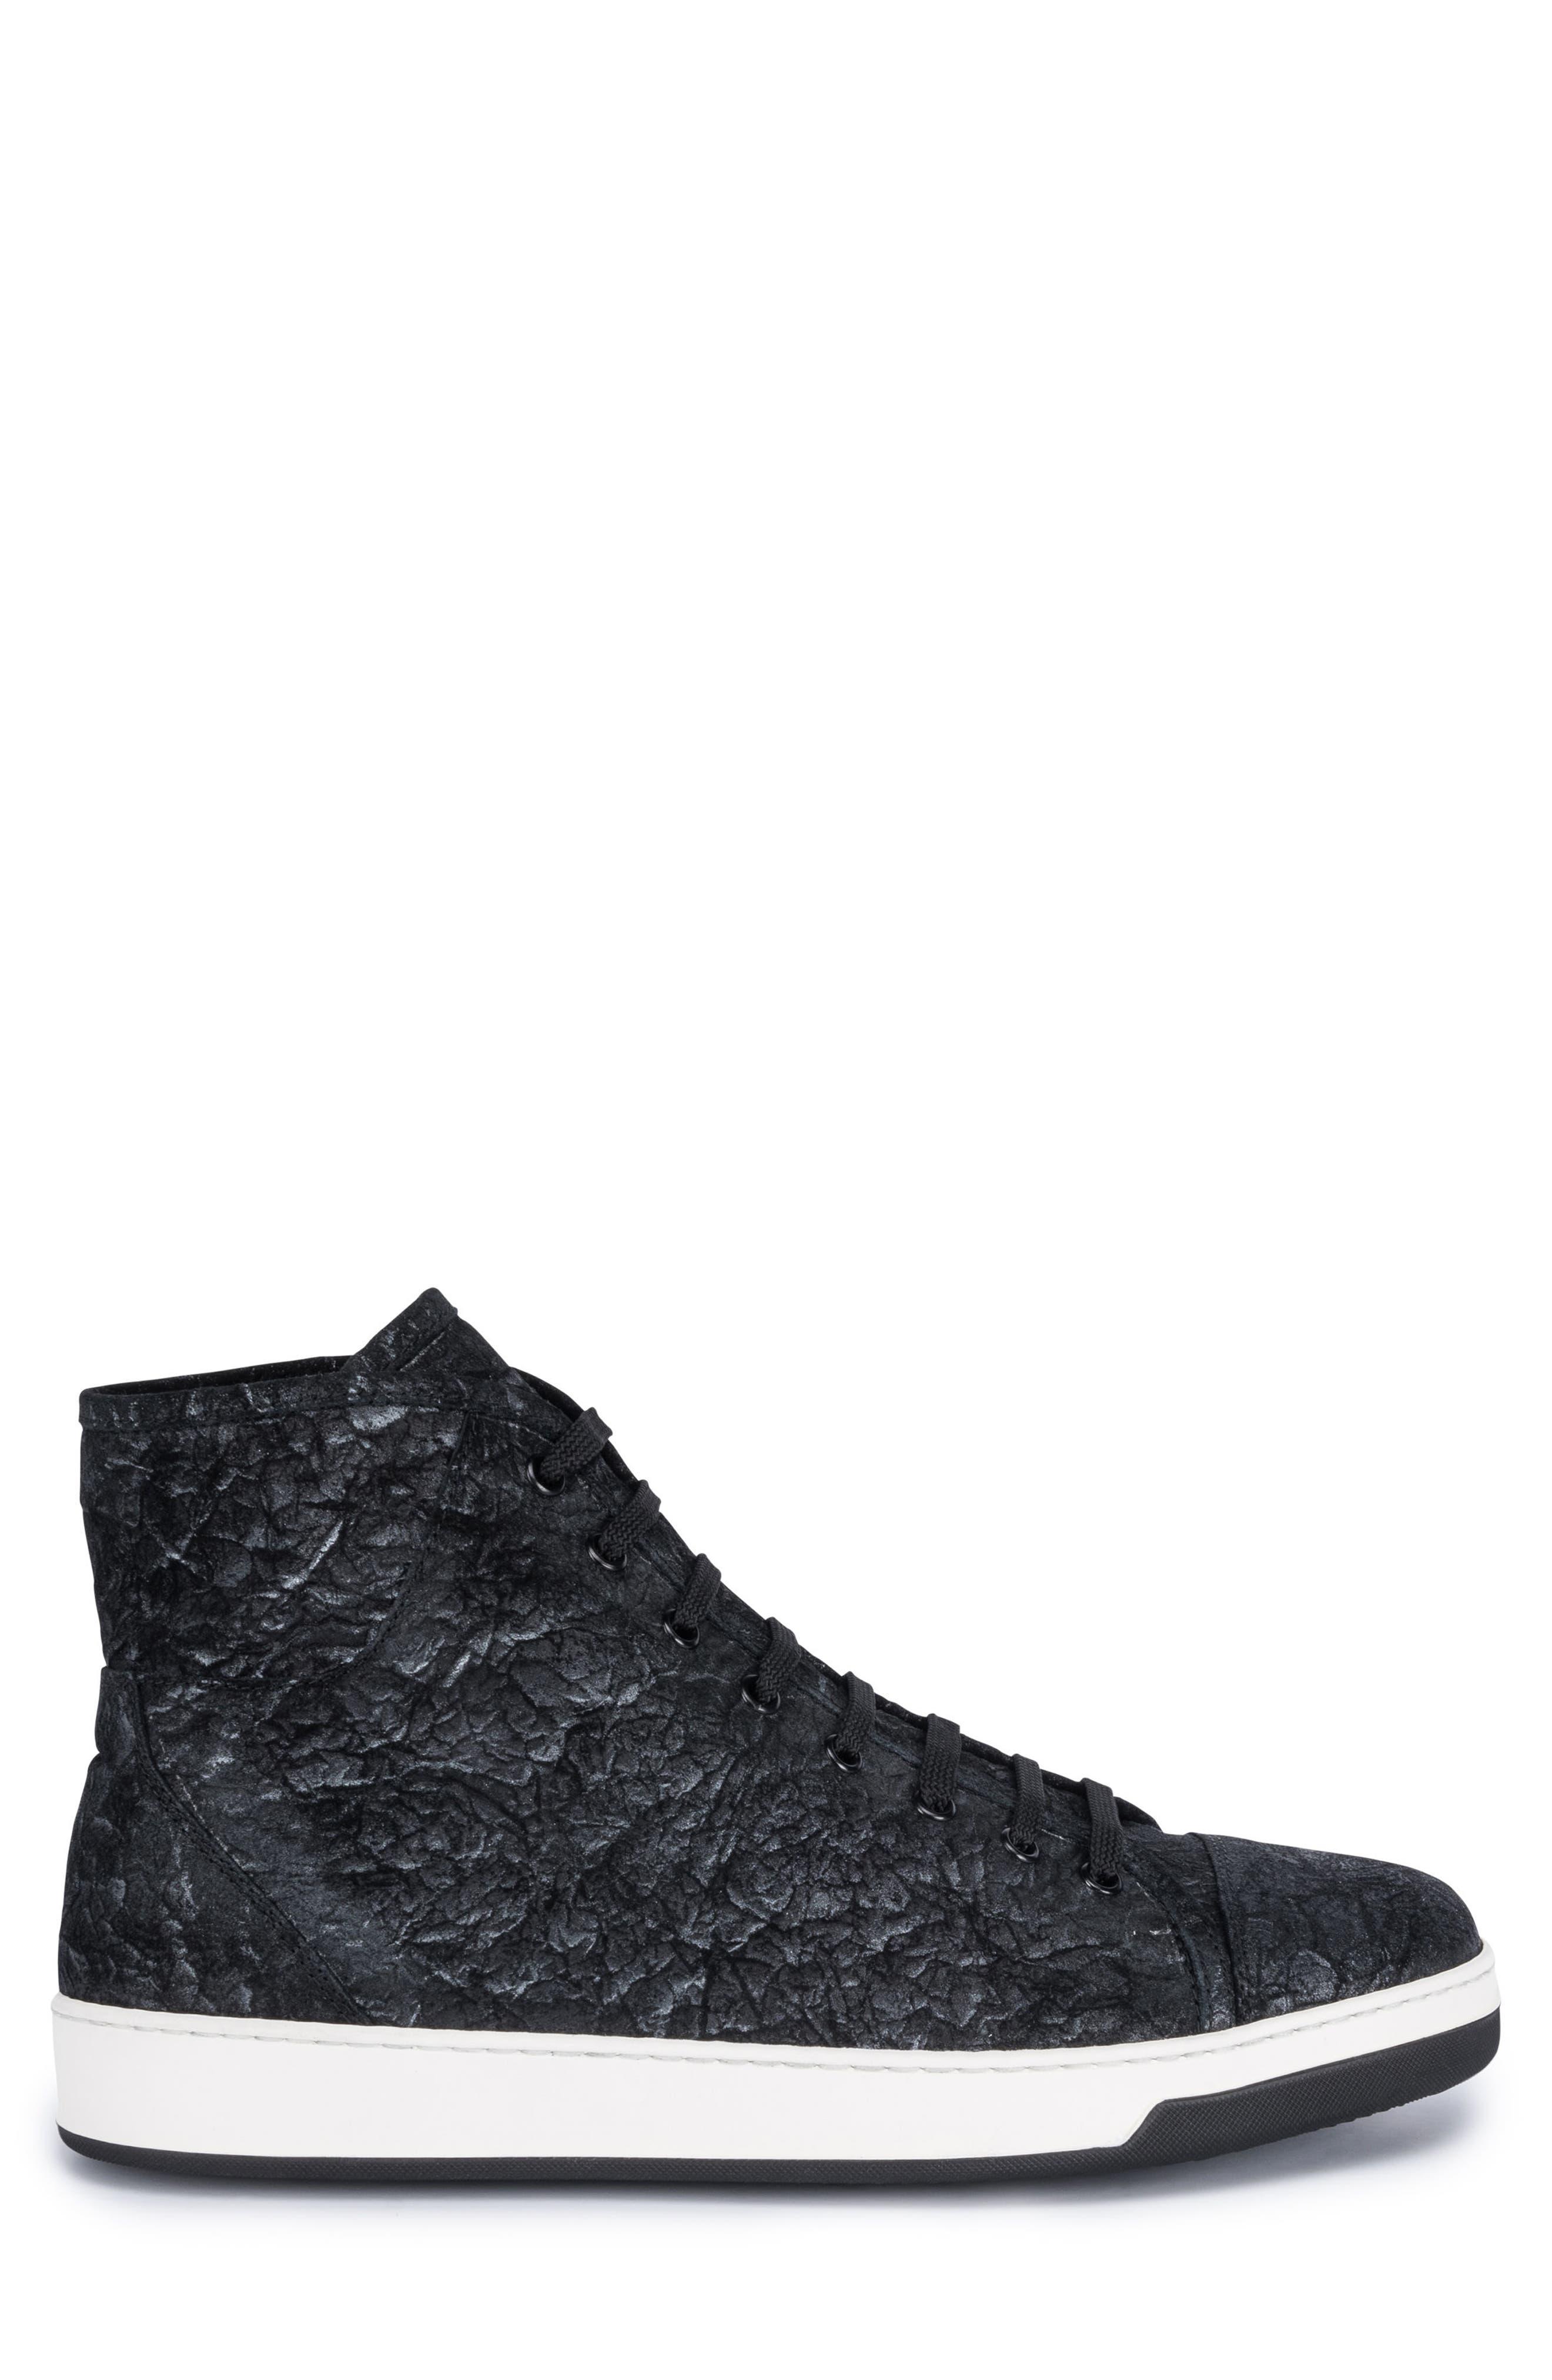 Pompeii Sneaker,                             Alternate thumbnail 3, color,                             Nero